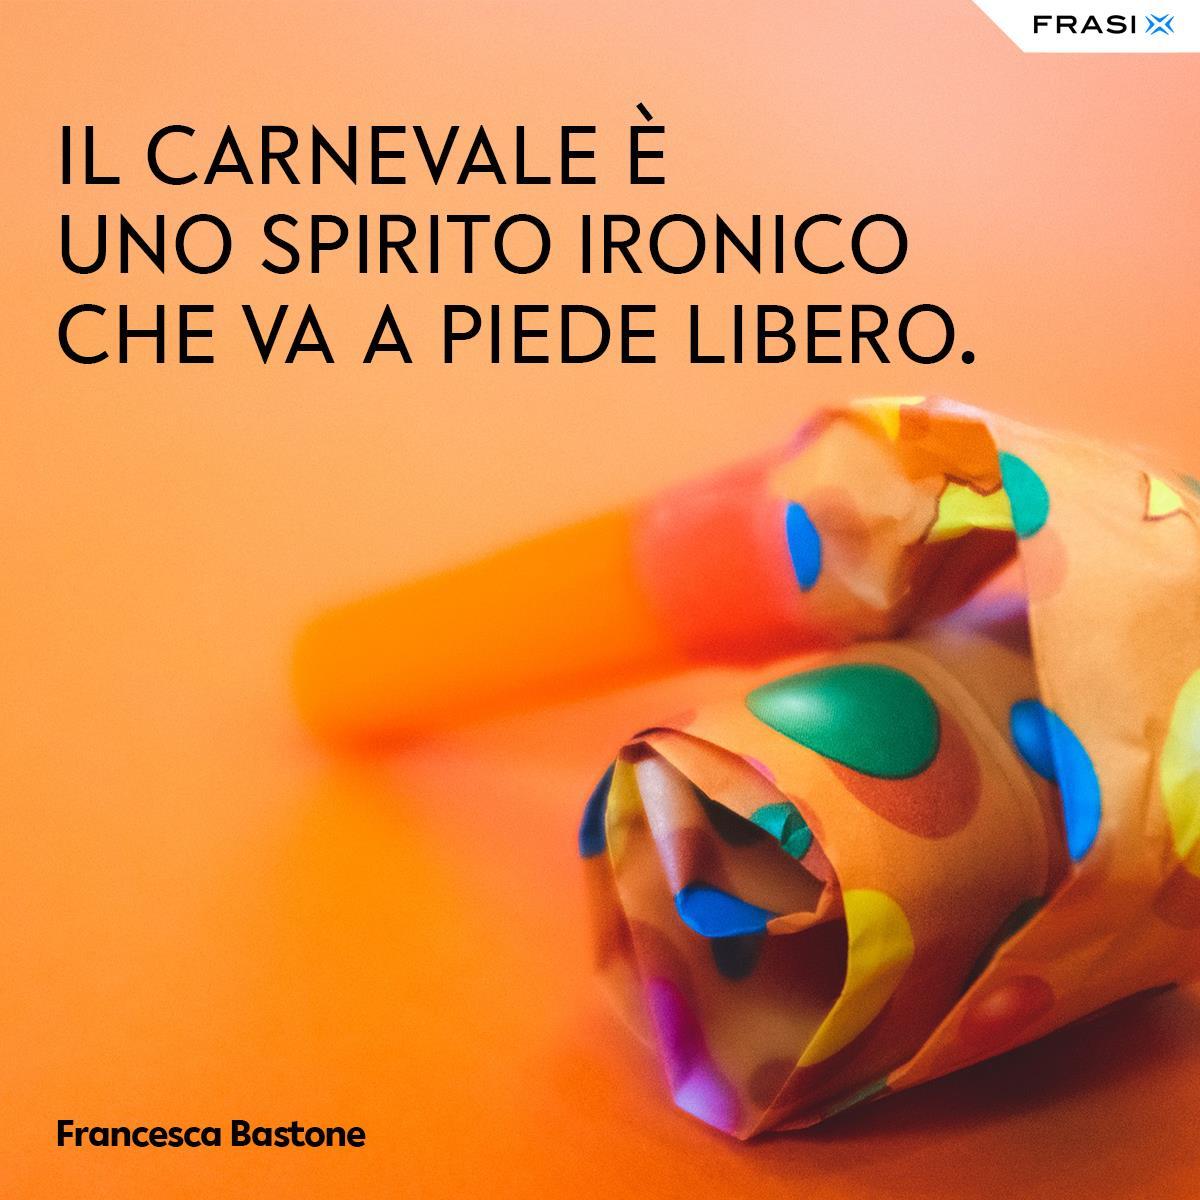 Frasi Carnevale Francesca Bastone